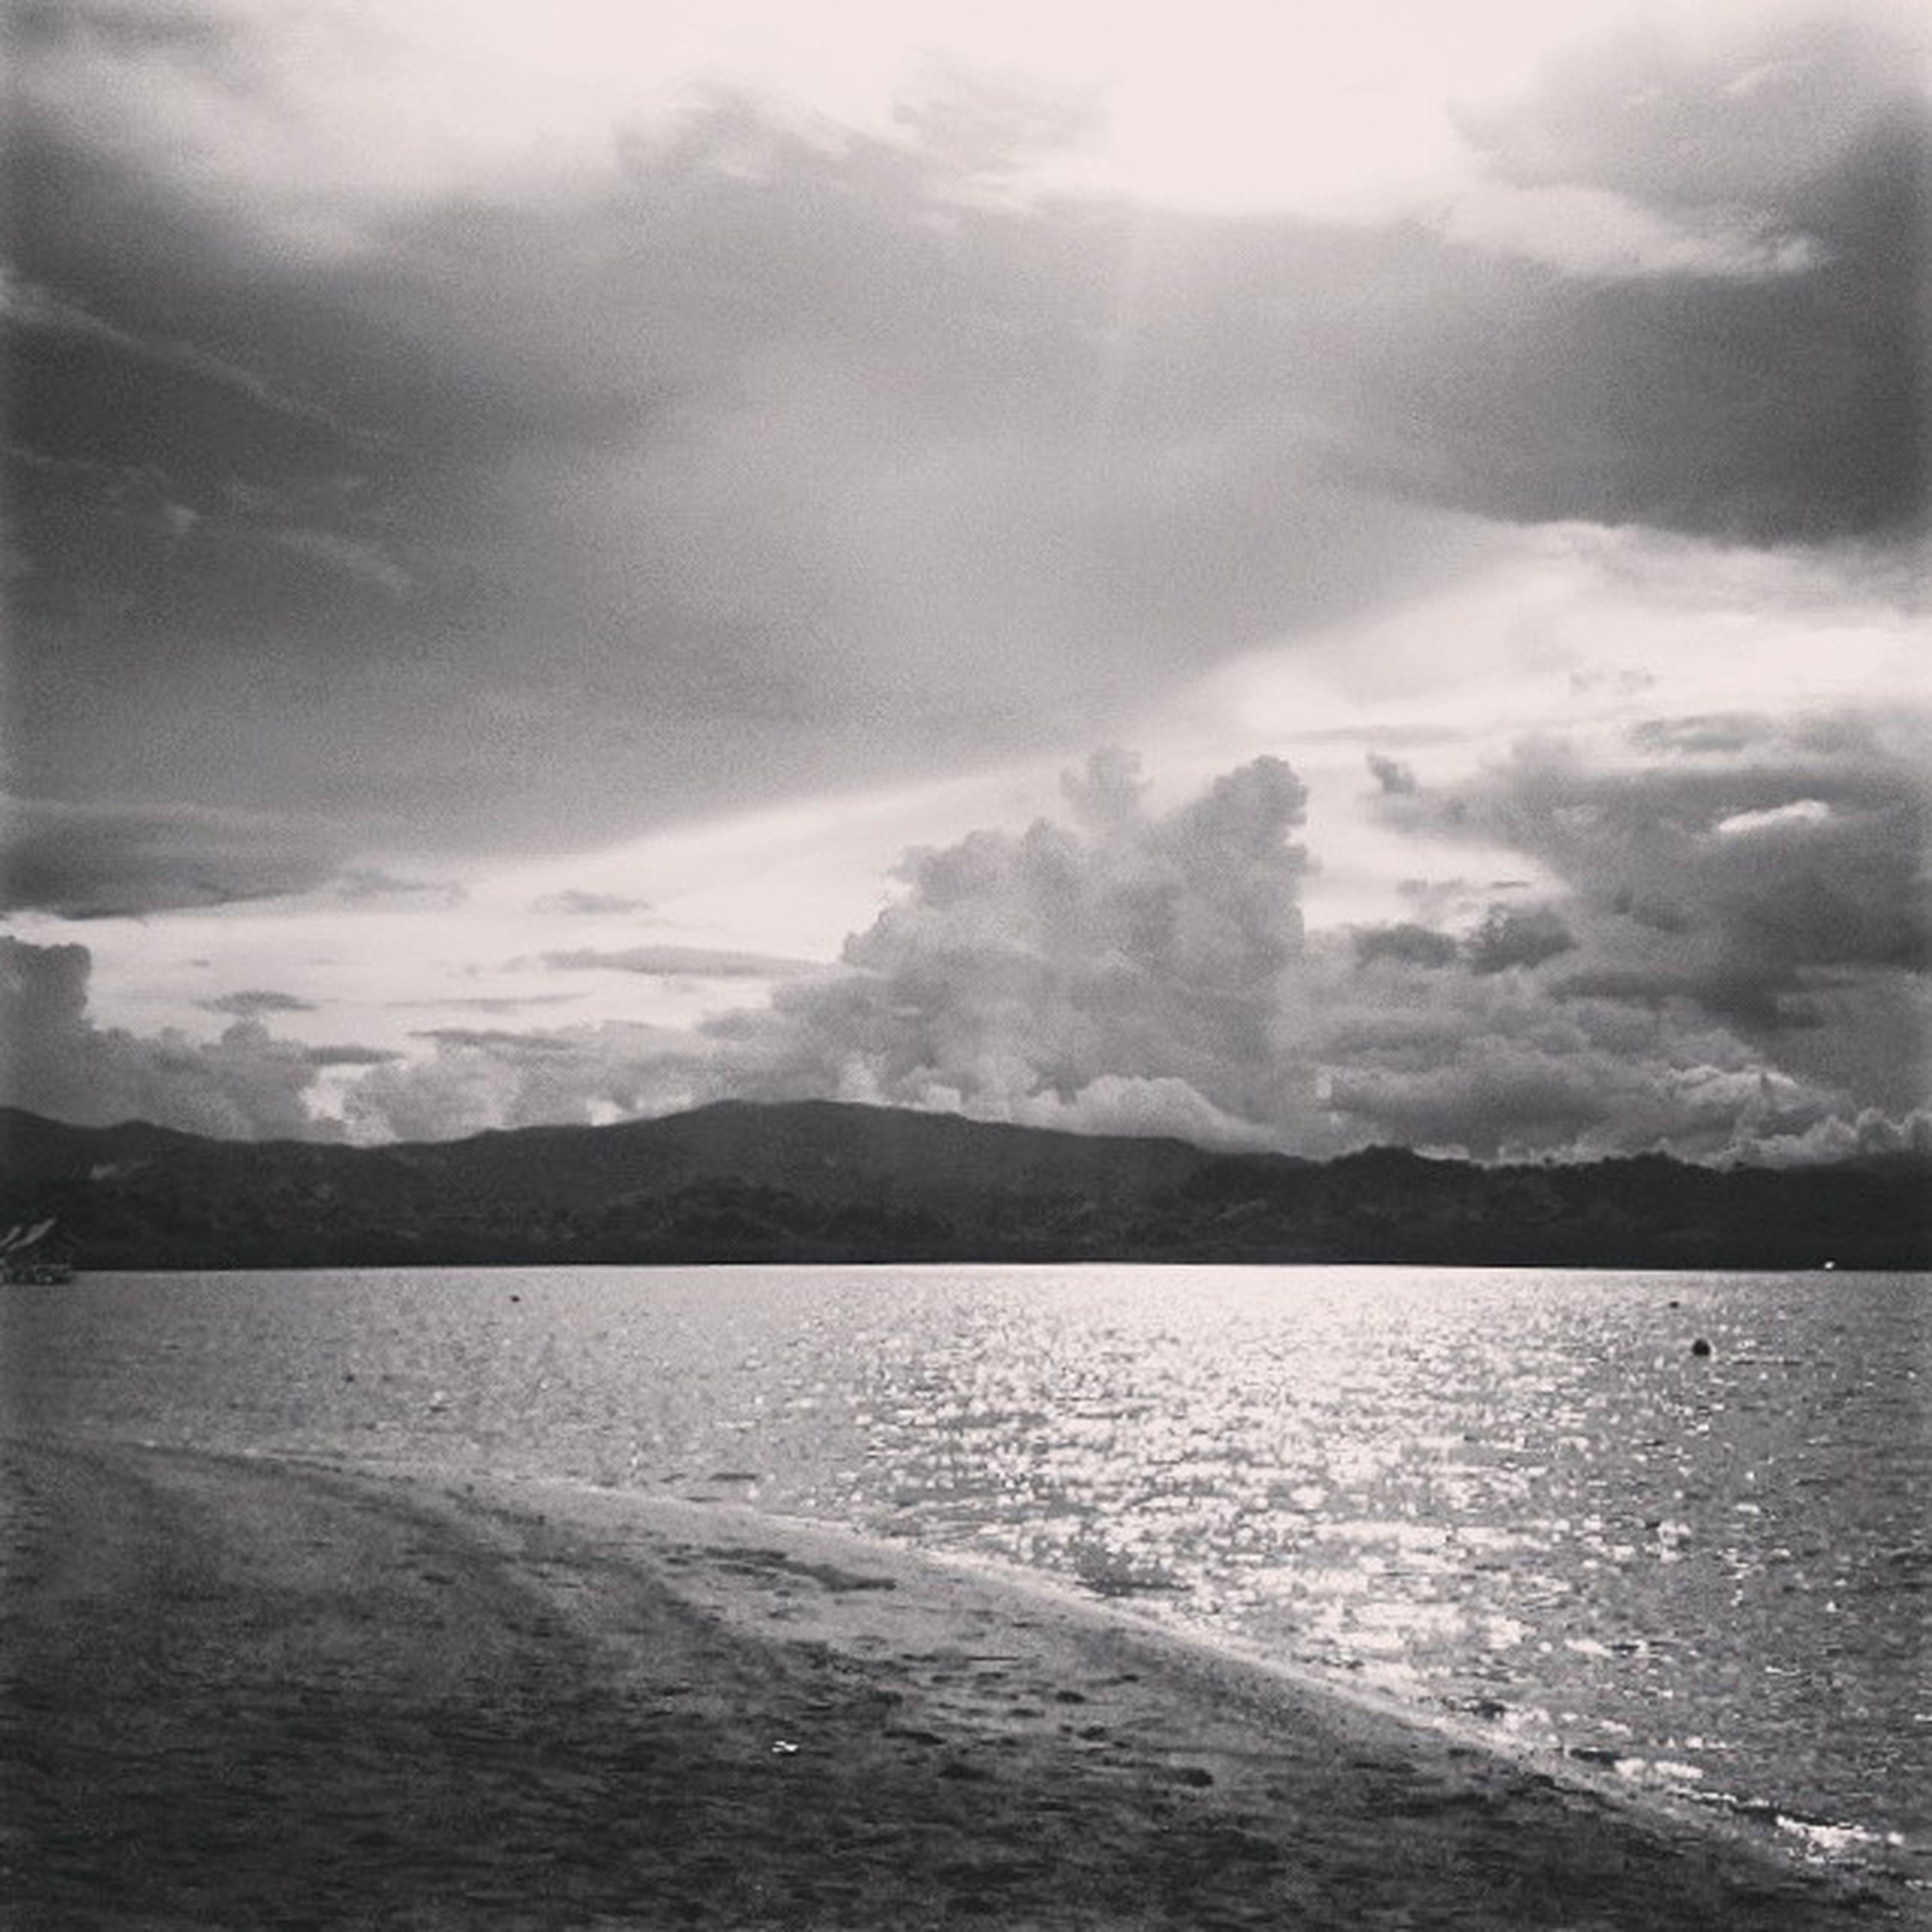 water, sky, sea, tranquil scene, scenics, tranquility, beauty in nature, beach, cloud - sky, nature, shore, cloudy, cloud, mountain, sand, idyllic, outdoors, coastline, sunlight, non-urban scene